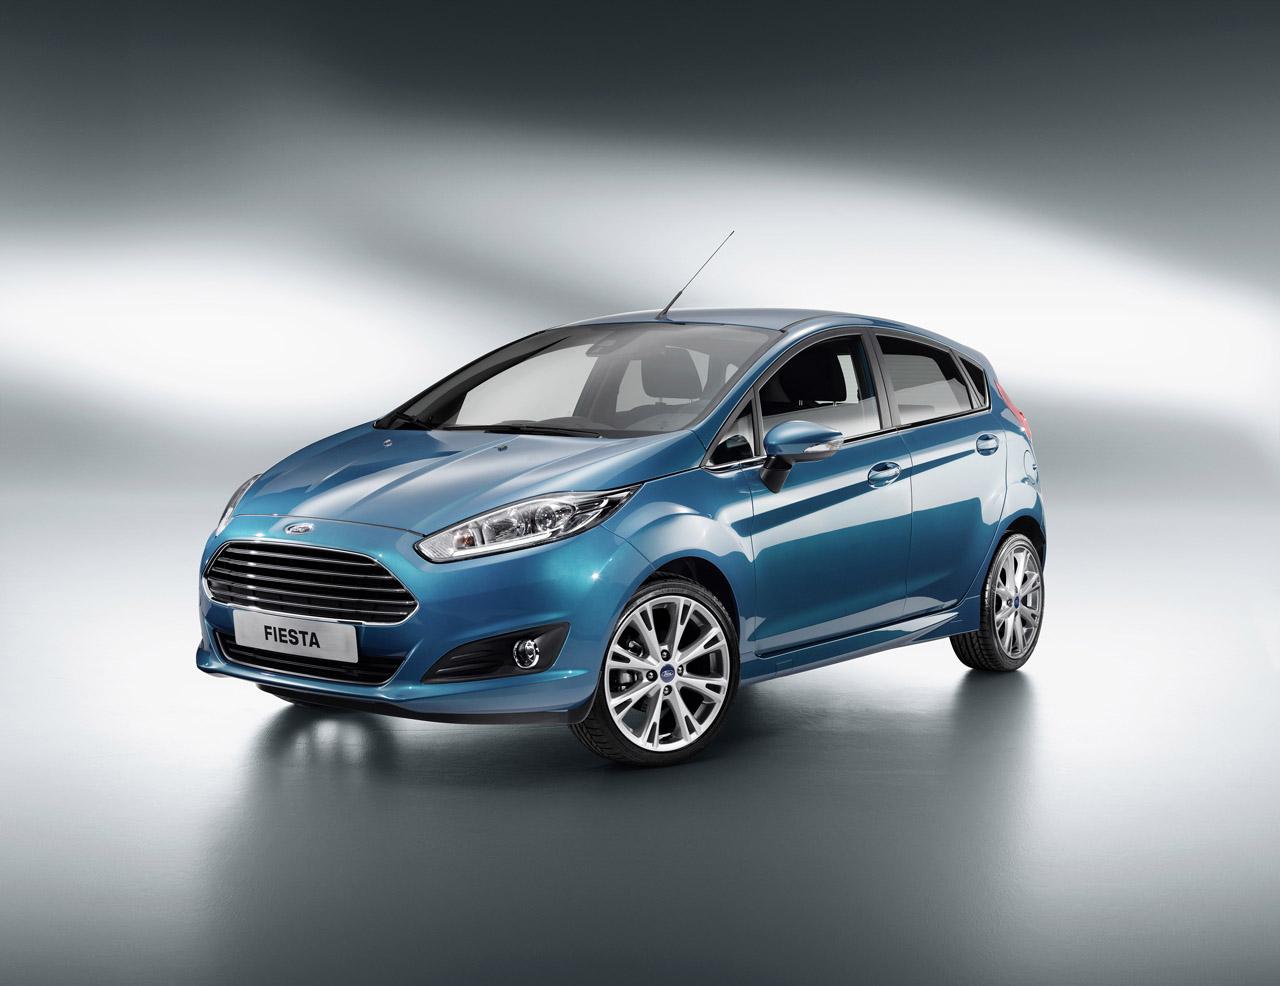 2014 Ford Fiesta 1.0 EcoBoost